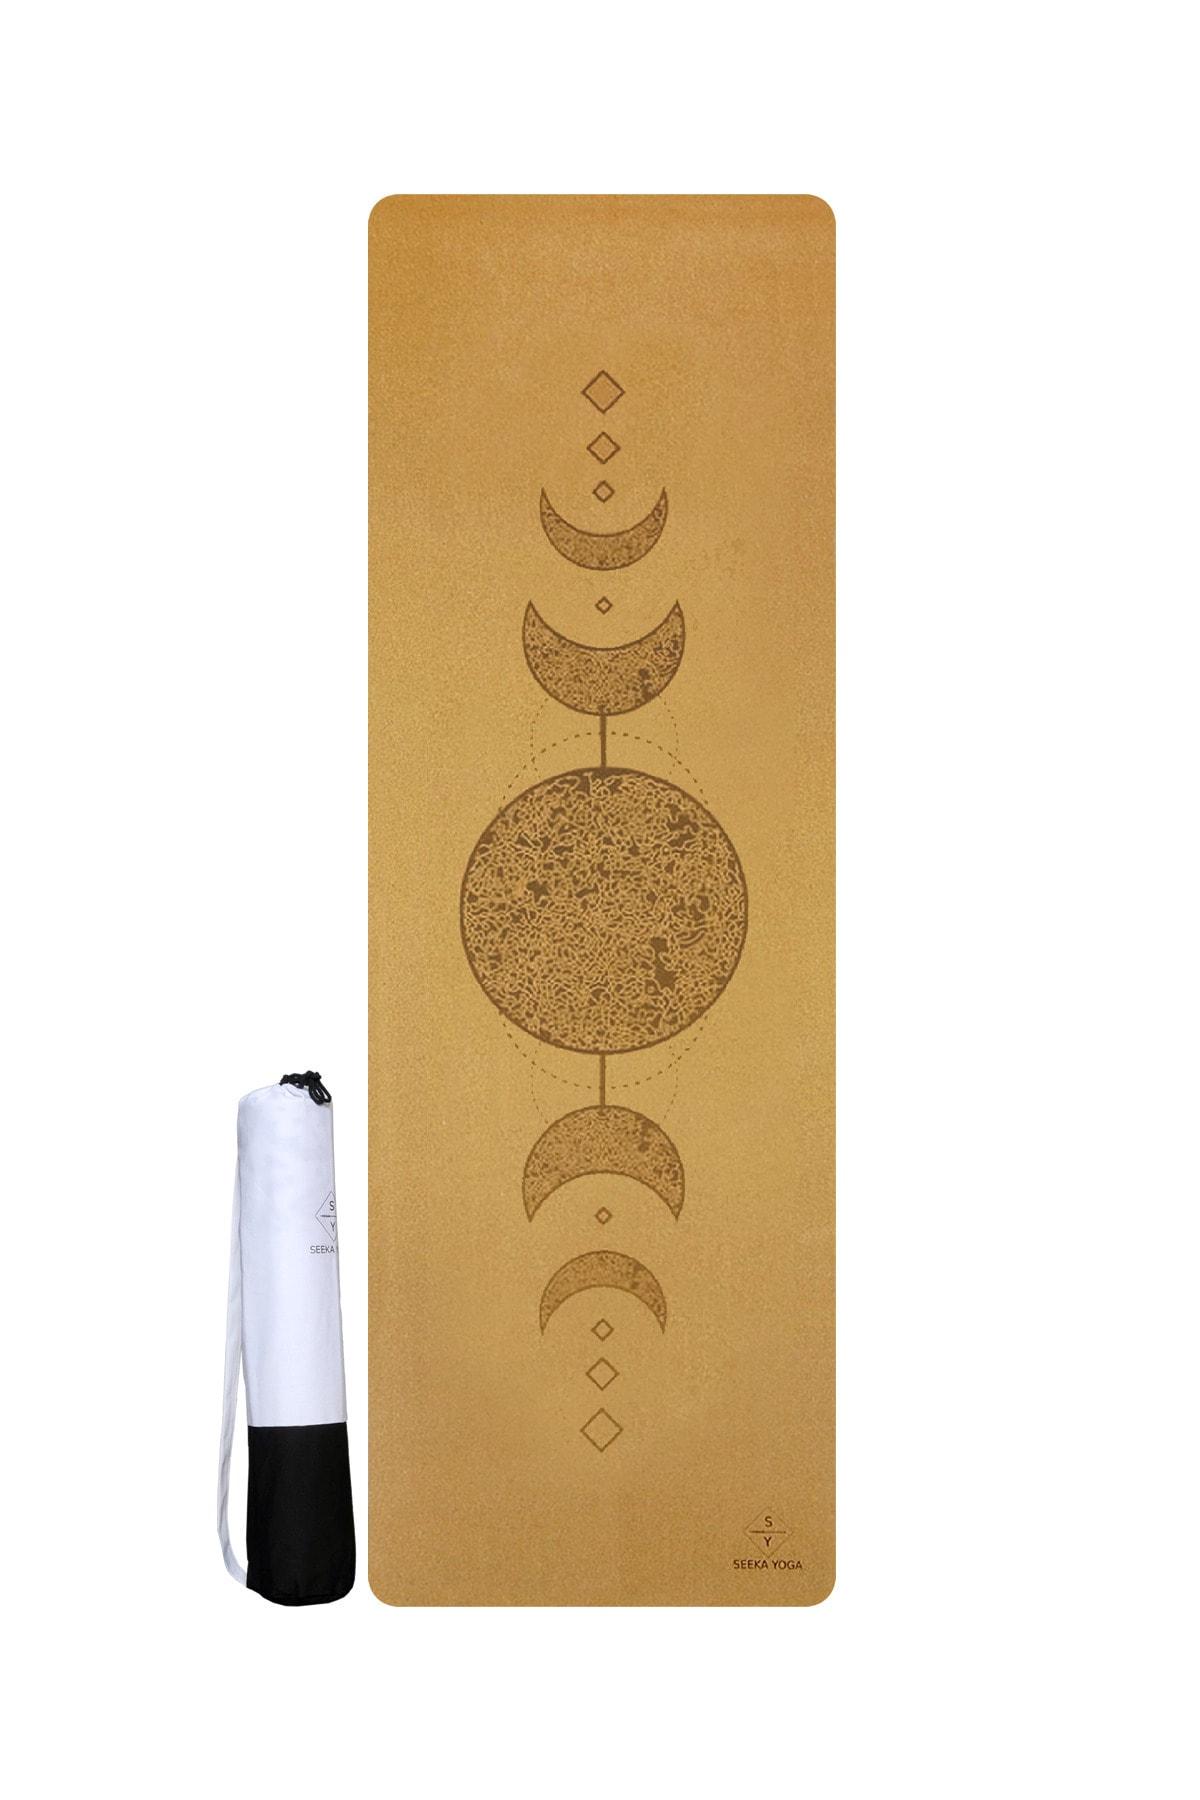 Moon Mantar Yüzeyli Doğal Kauçuk Yoga Matı